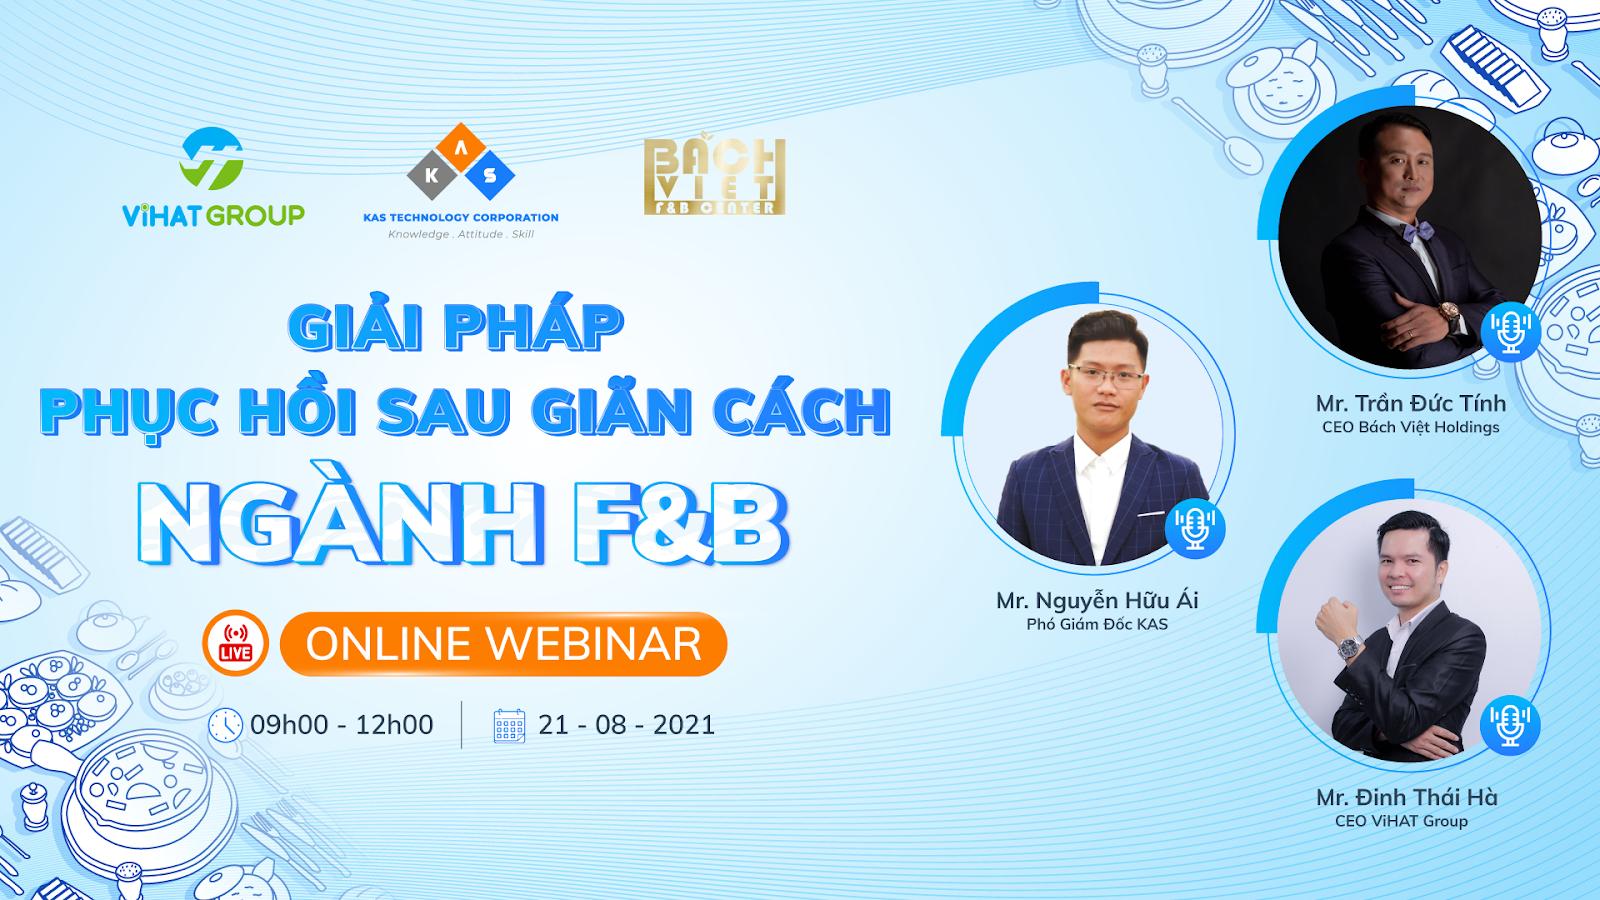 webinar-vihat-giai-phap-phuc-hoi-sau-gian-cach-nganh-F&B